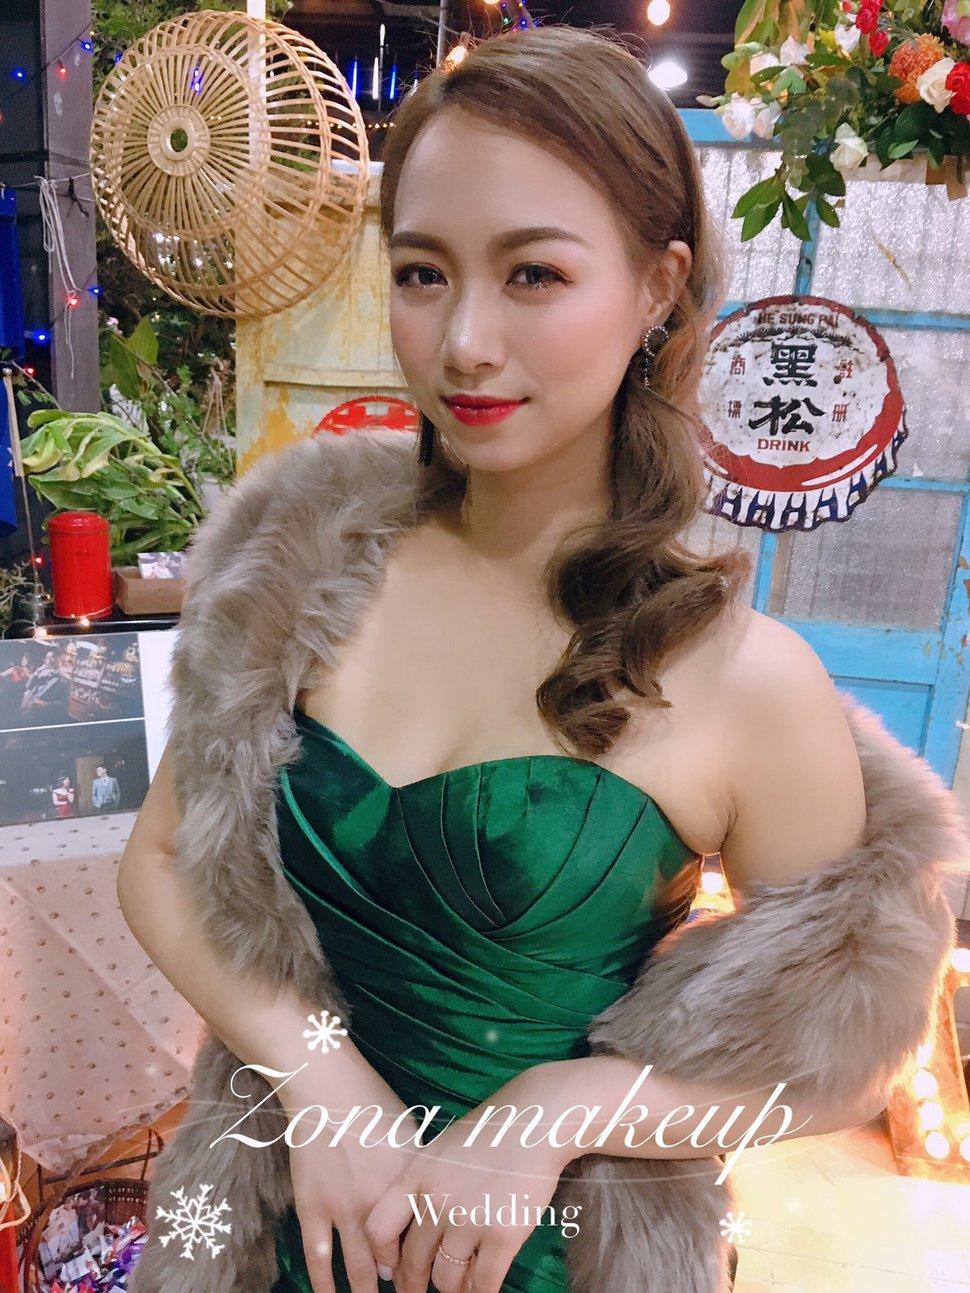 2019410_190410_0102 - Zona時尚美甲x新娘秘書整體造型工作室《結婚吧》